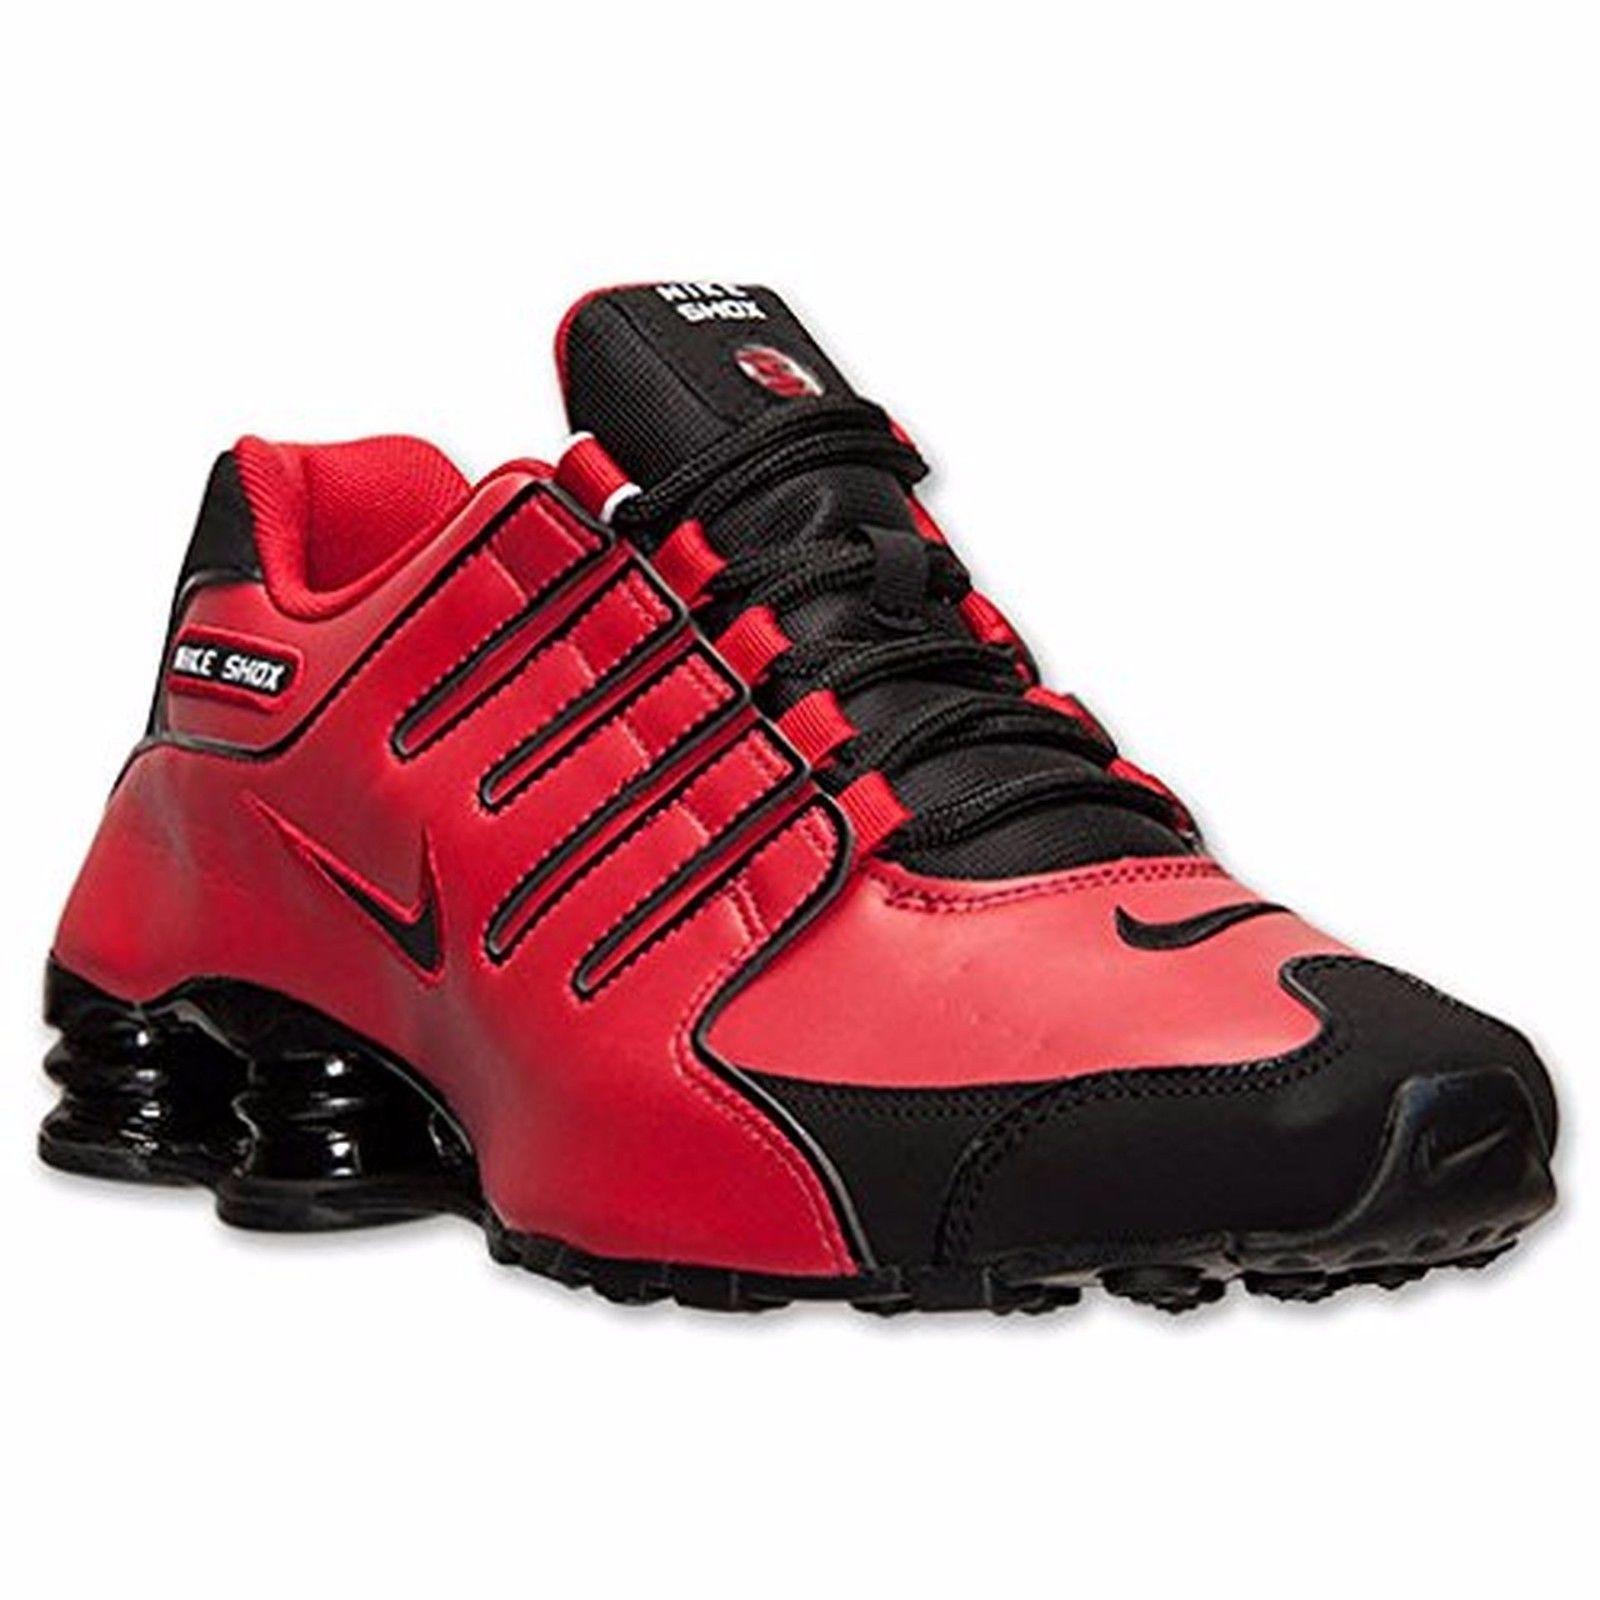 Nike Shox NZ Shoe Mens size 8.5 378341-600 University Red  5b31172b0